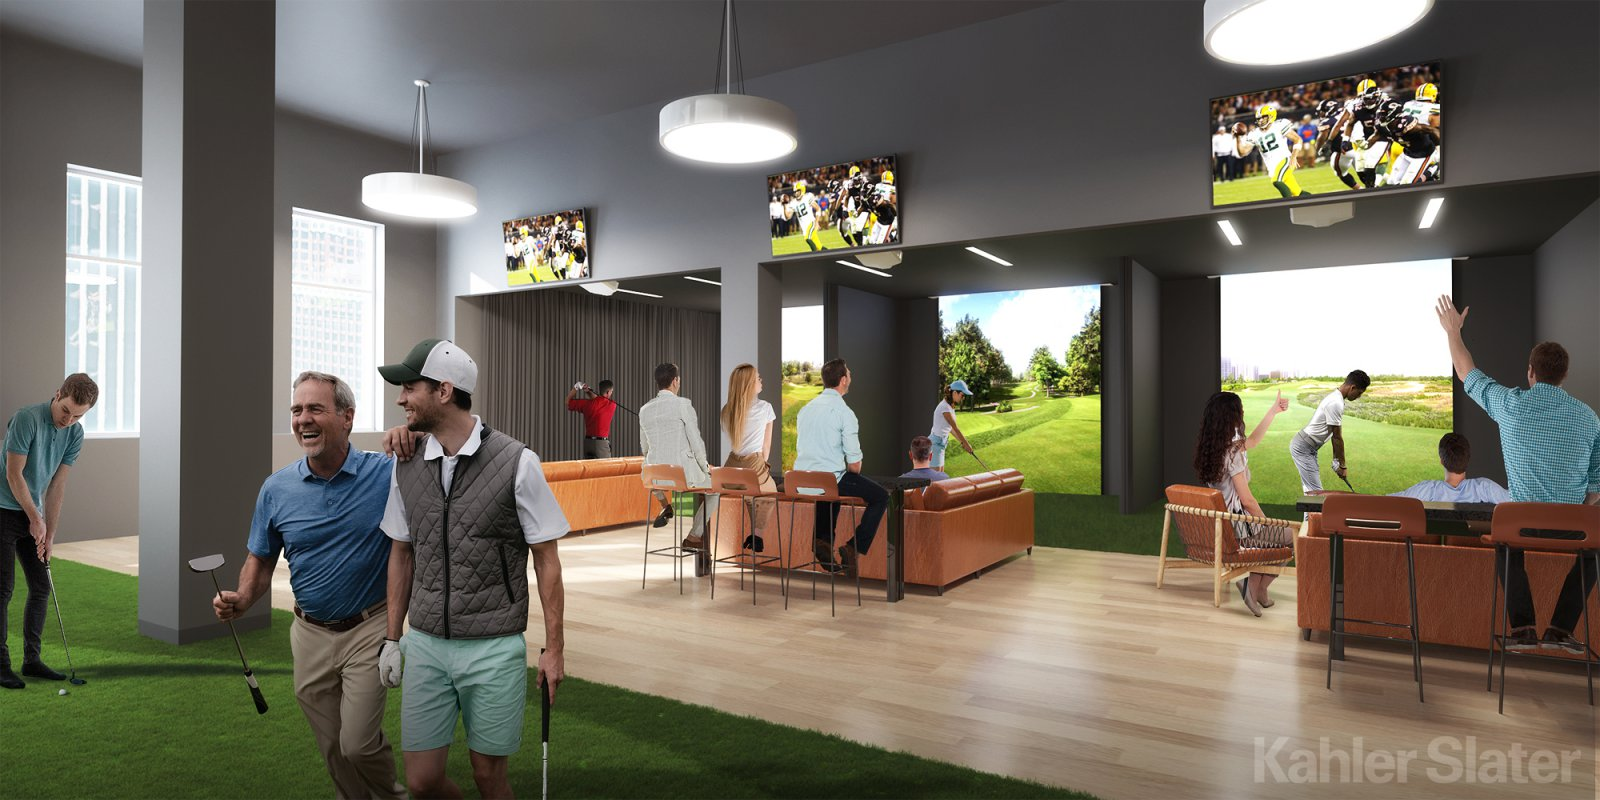 Golf Simulator at the MAC